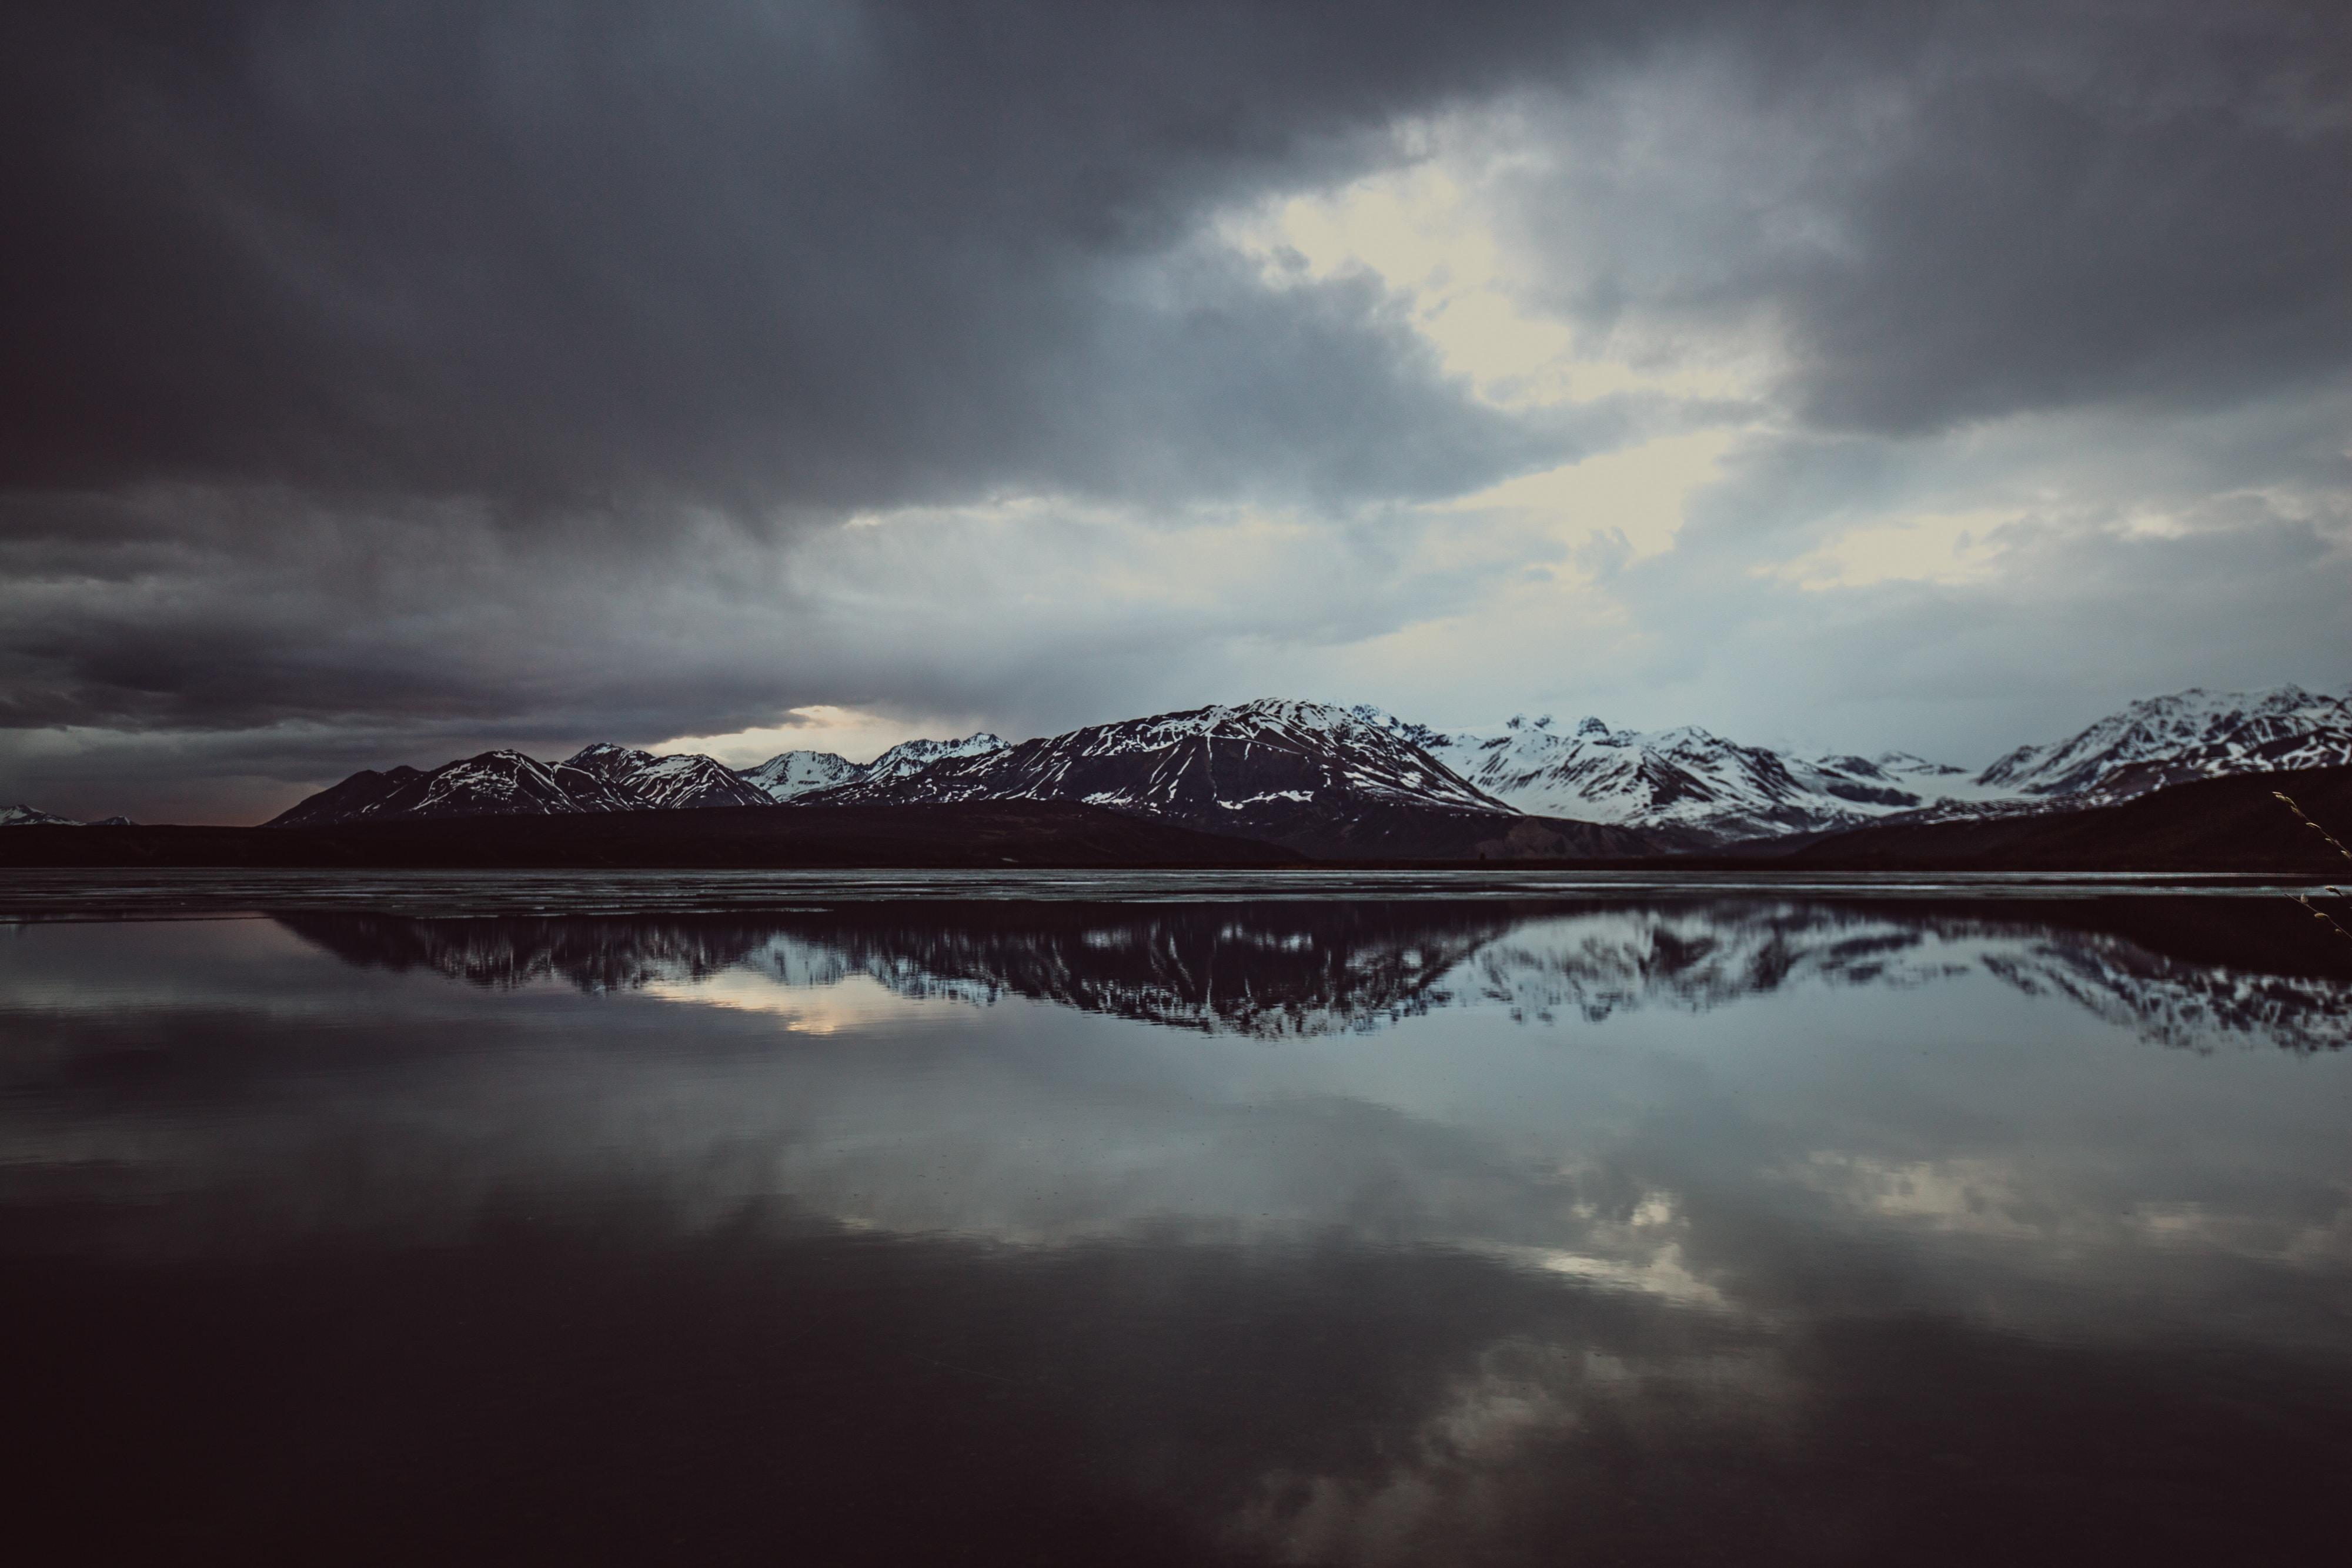 A snowcapped mountain range reflecting against Paxson Lake